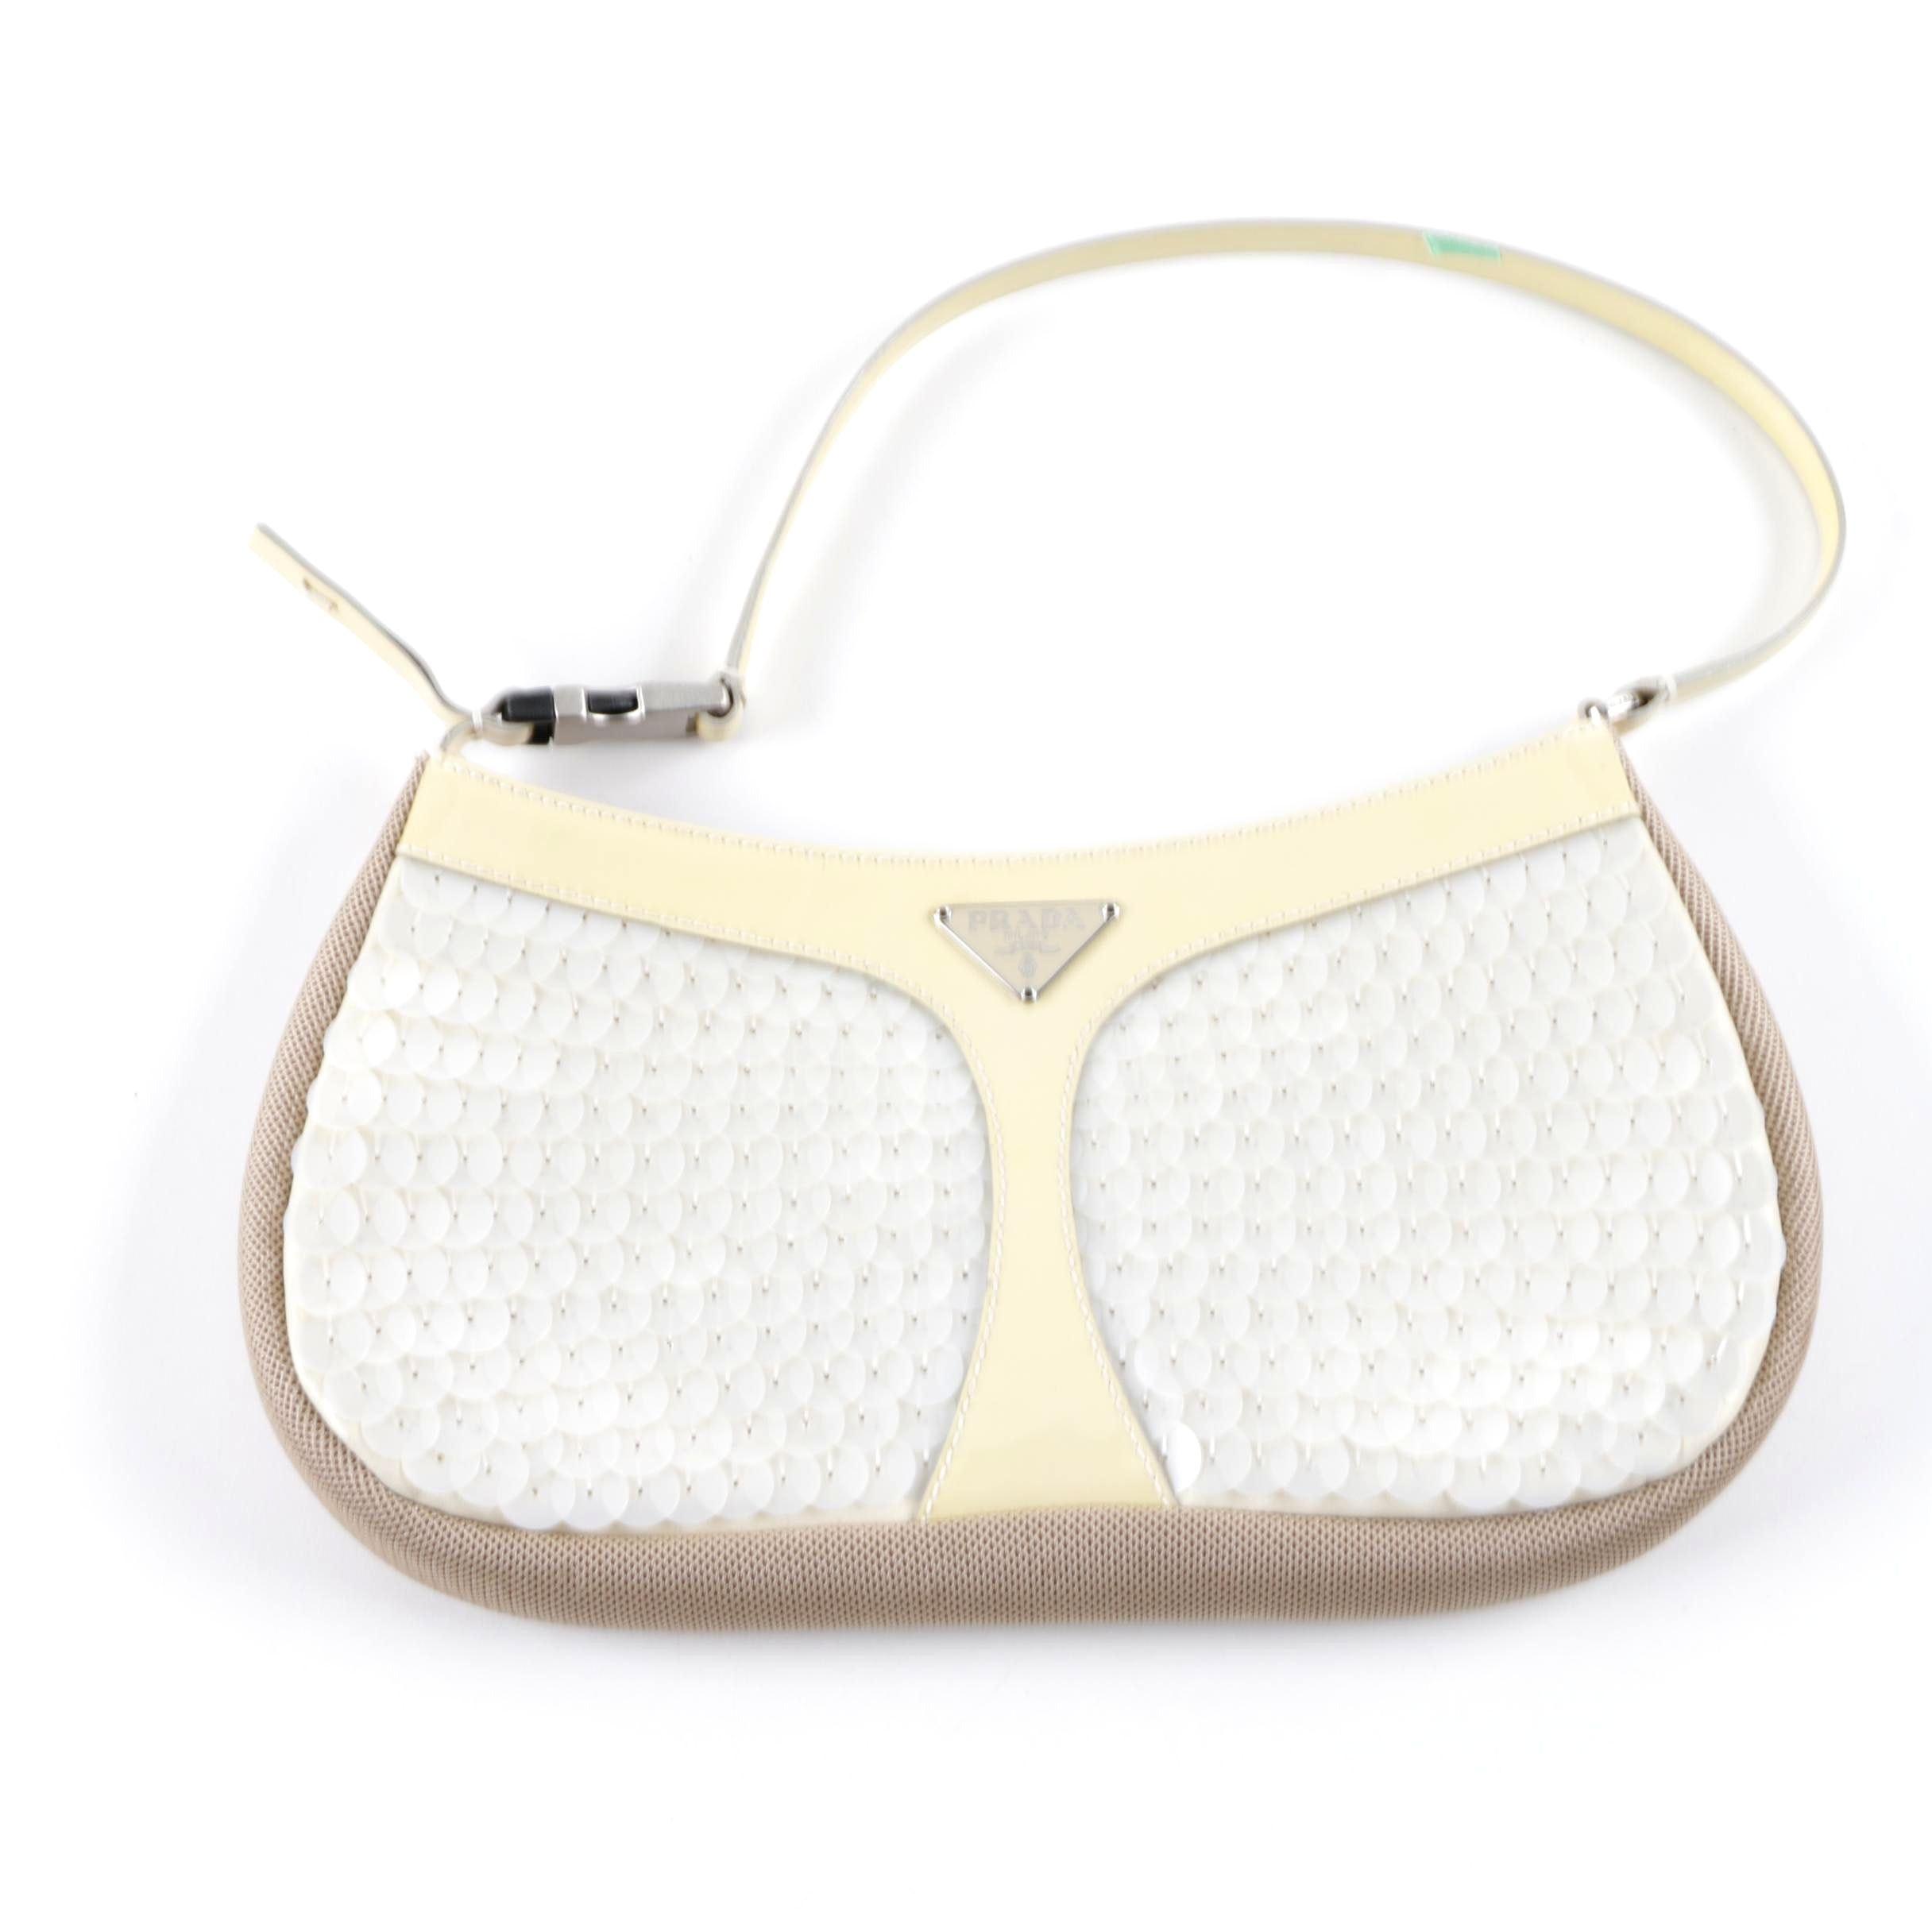 Prada Iridescent White Sequin Handbag